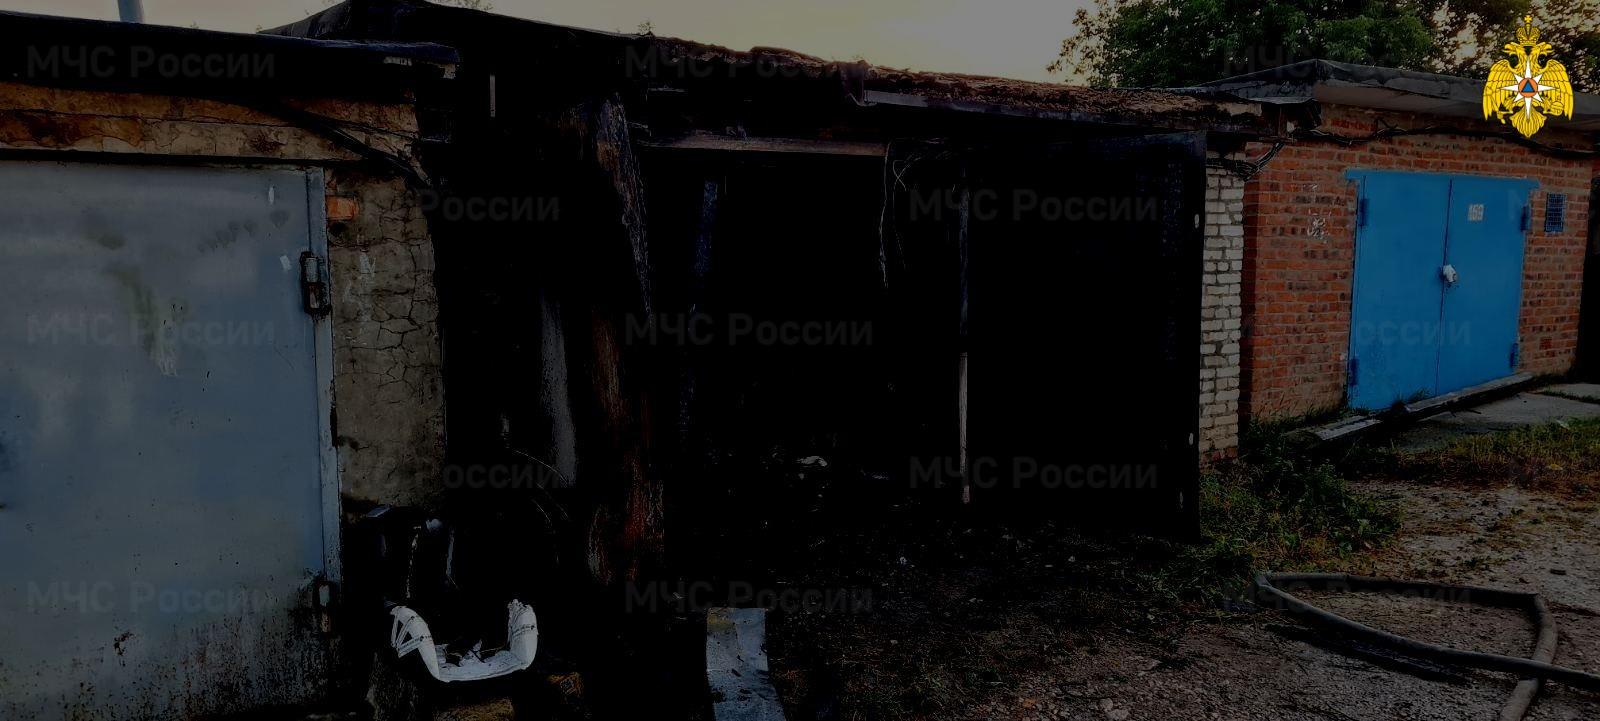 Пожар в Дзержинском районе, п. Товарково, ул. Набережная